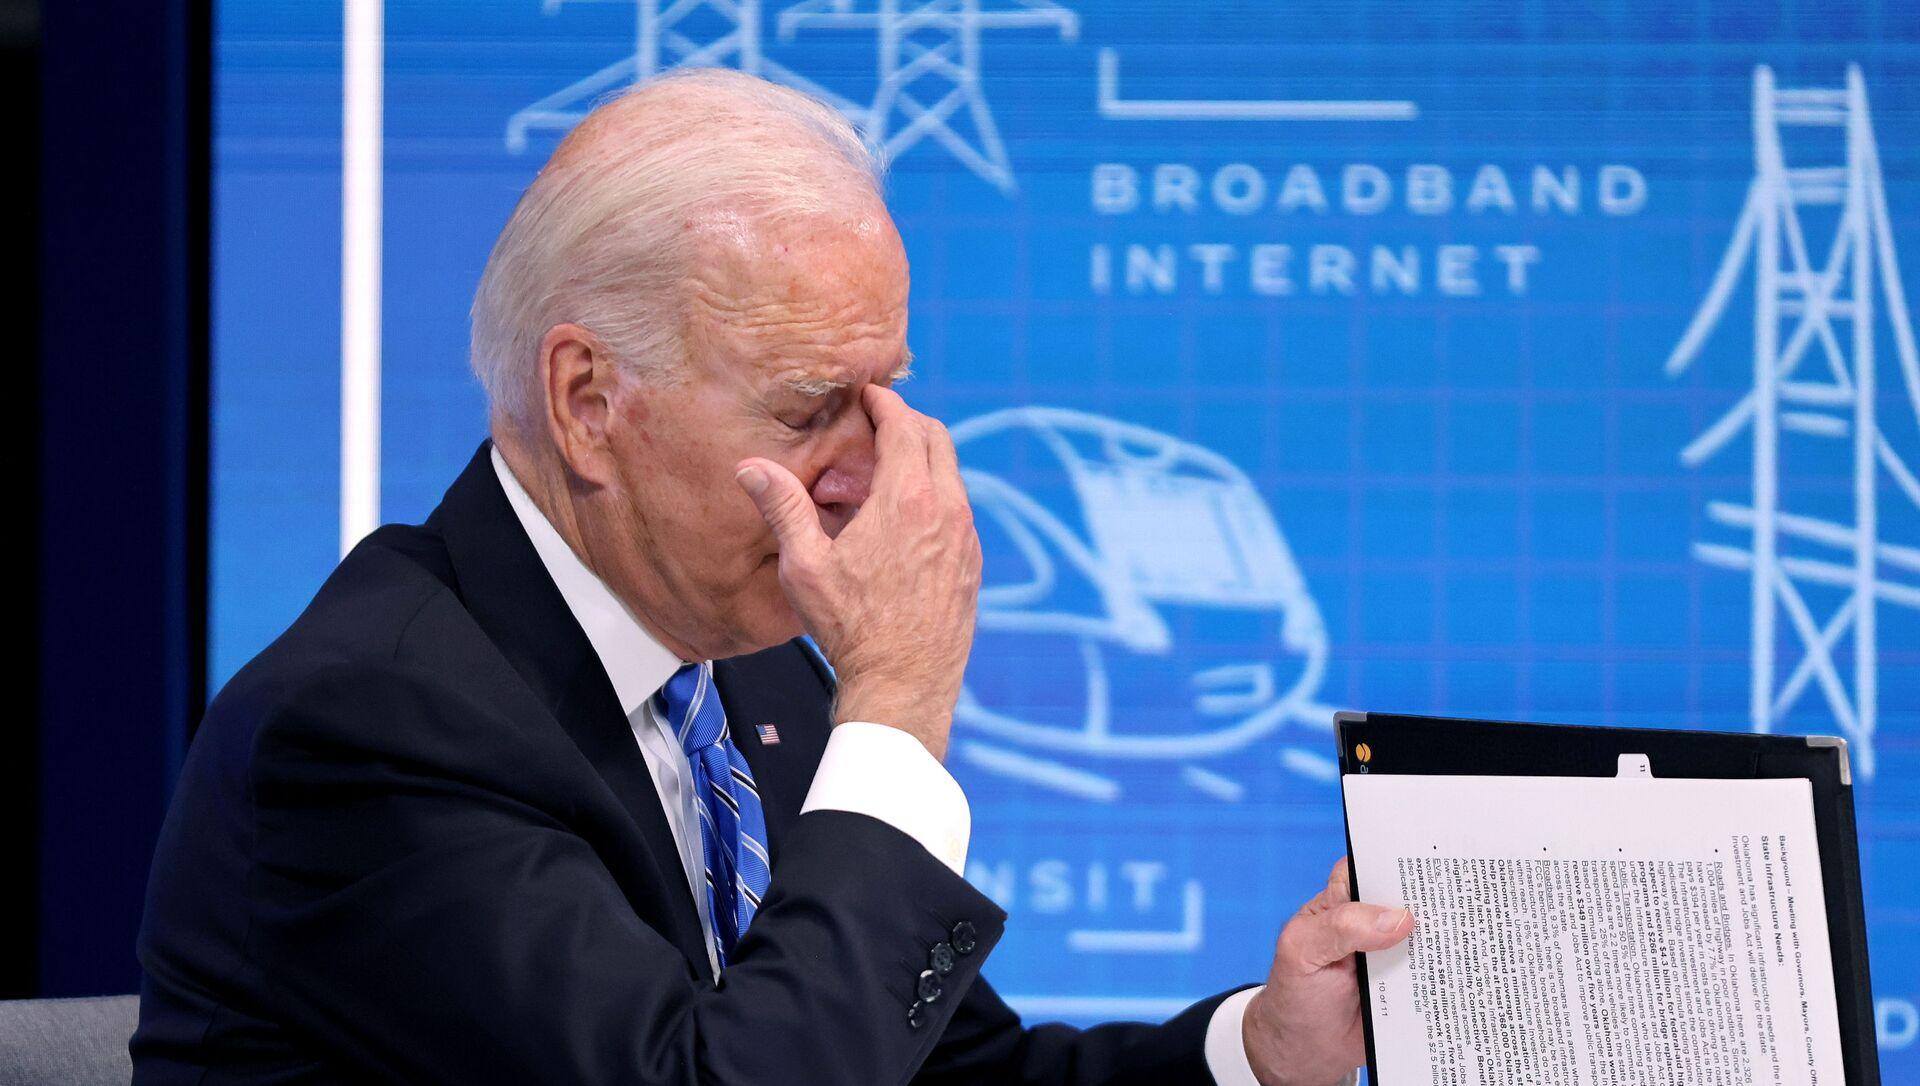 Joe Biden le 11 août 2021 - Sputnik France, 1920, 30.08.2021